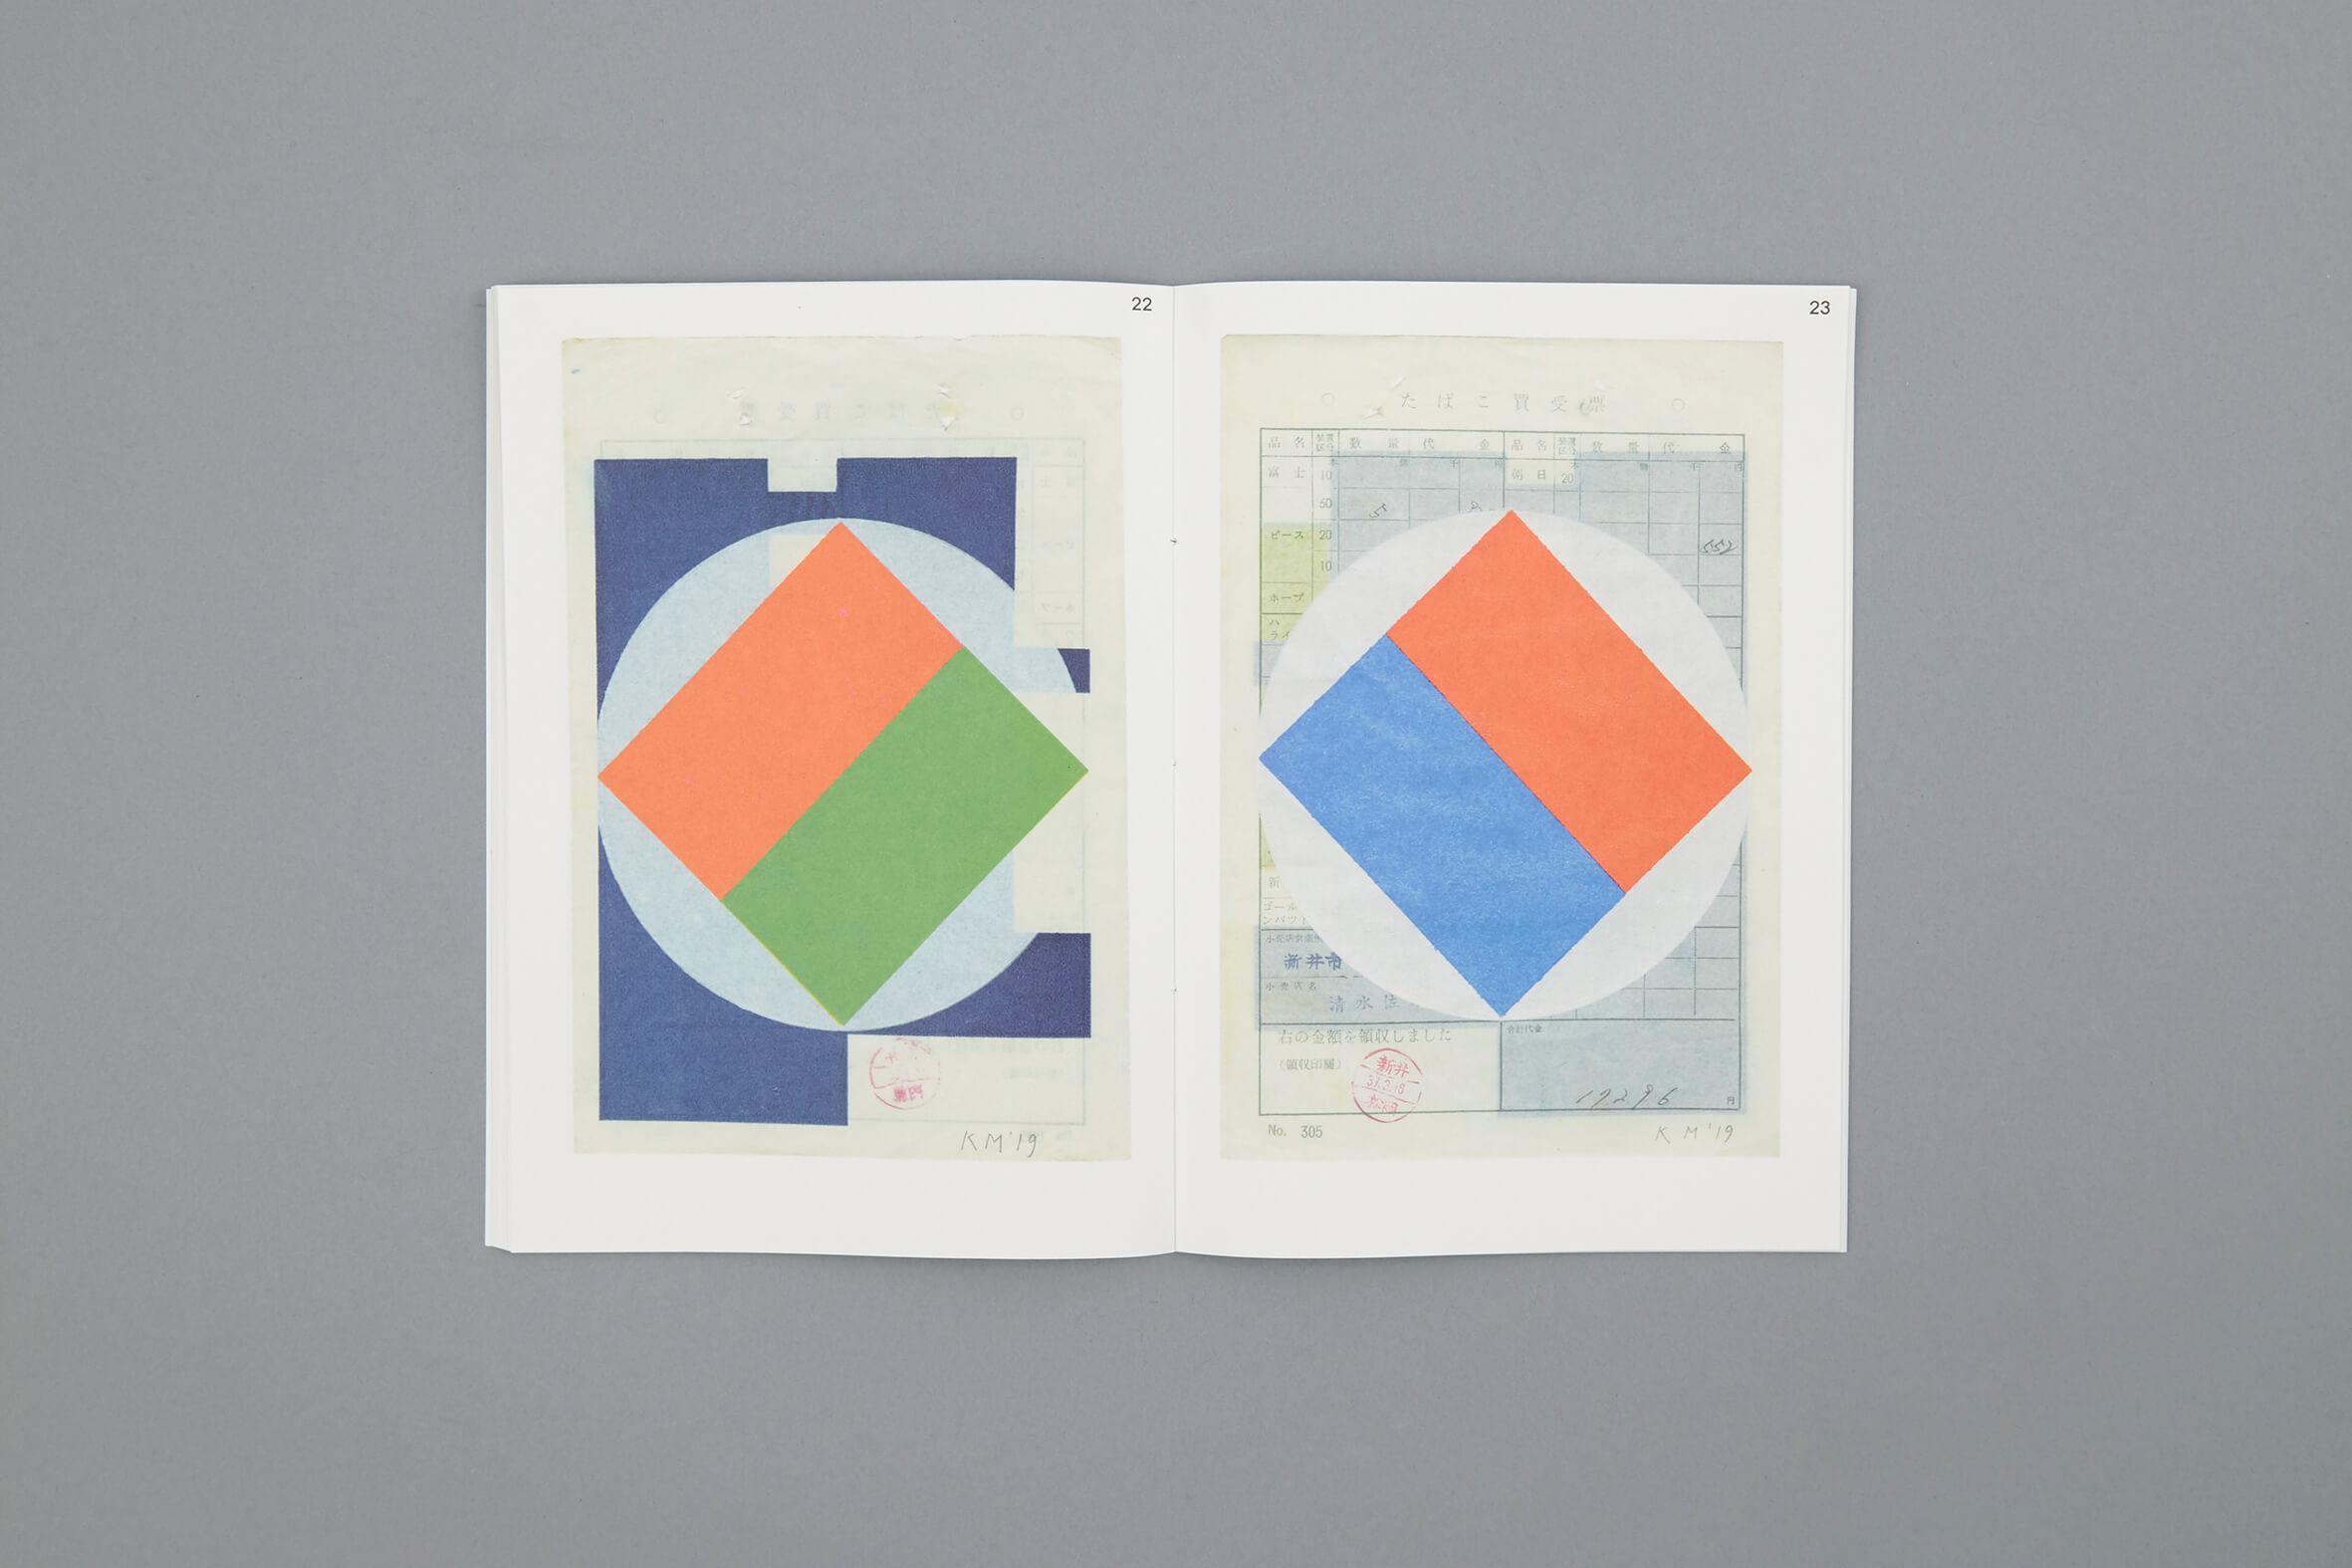 martens-tokyo-papers-delpire-co